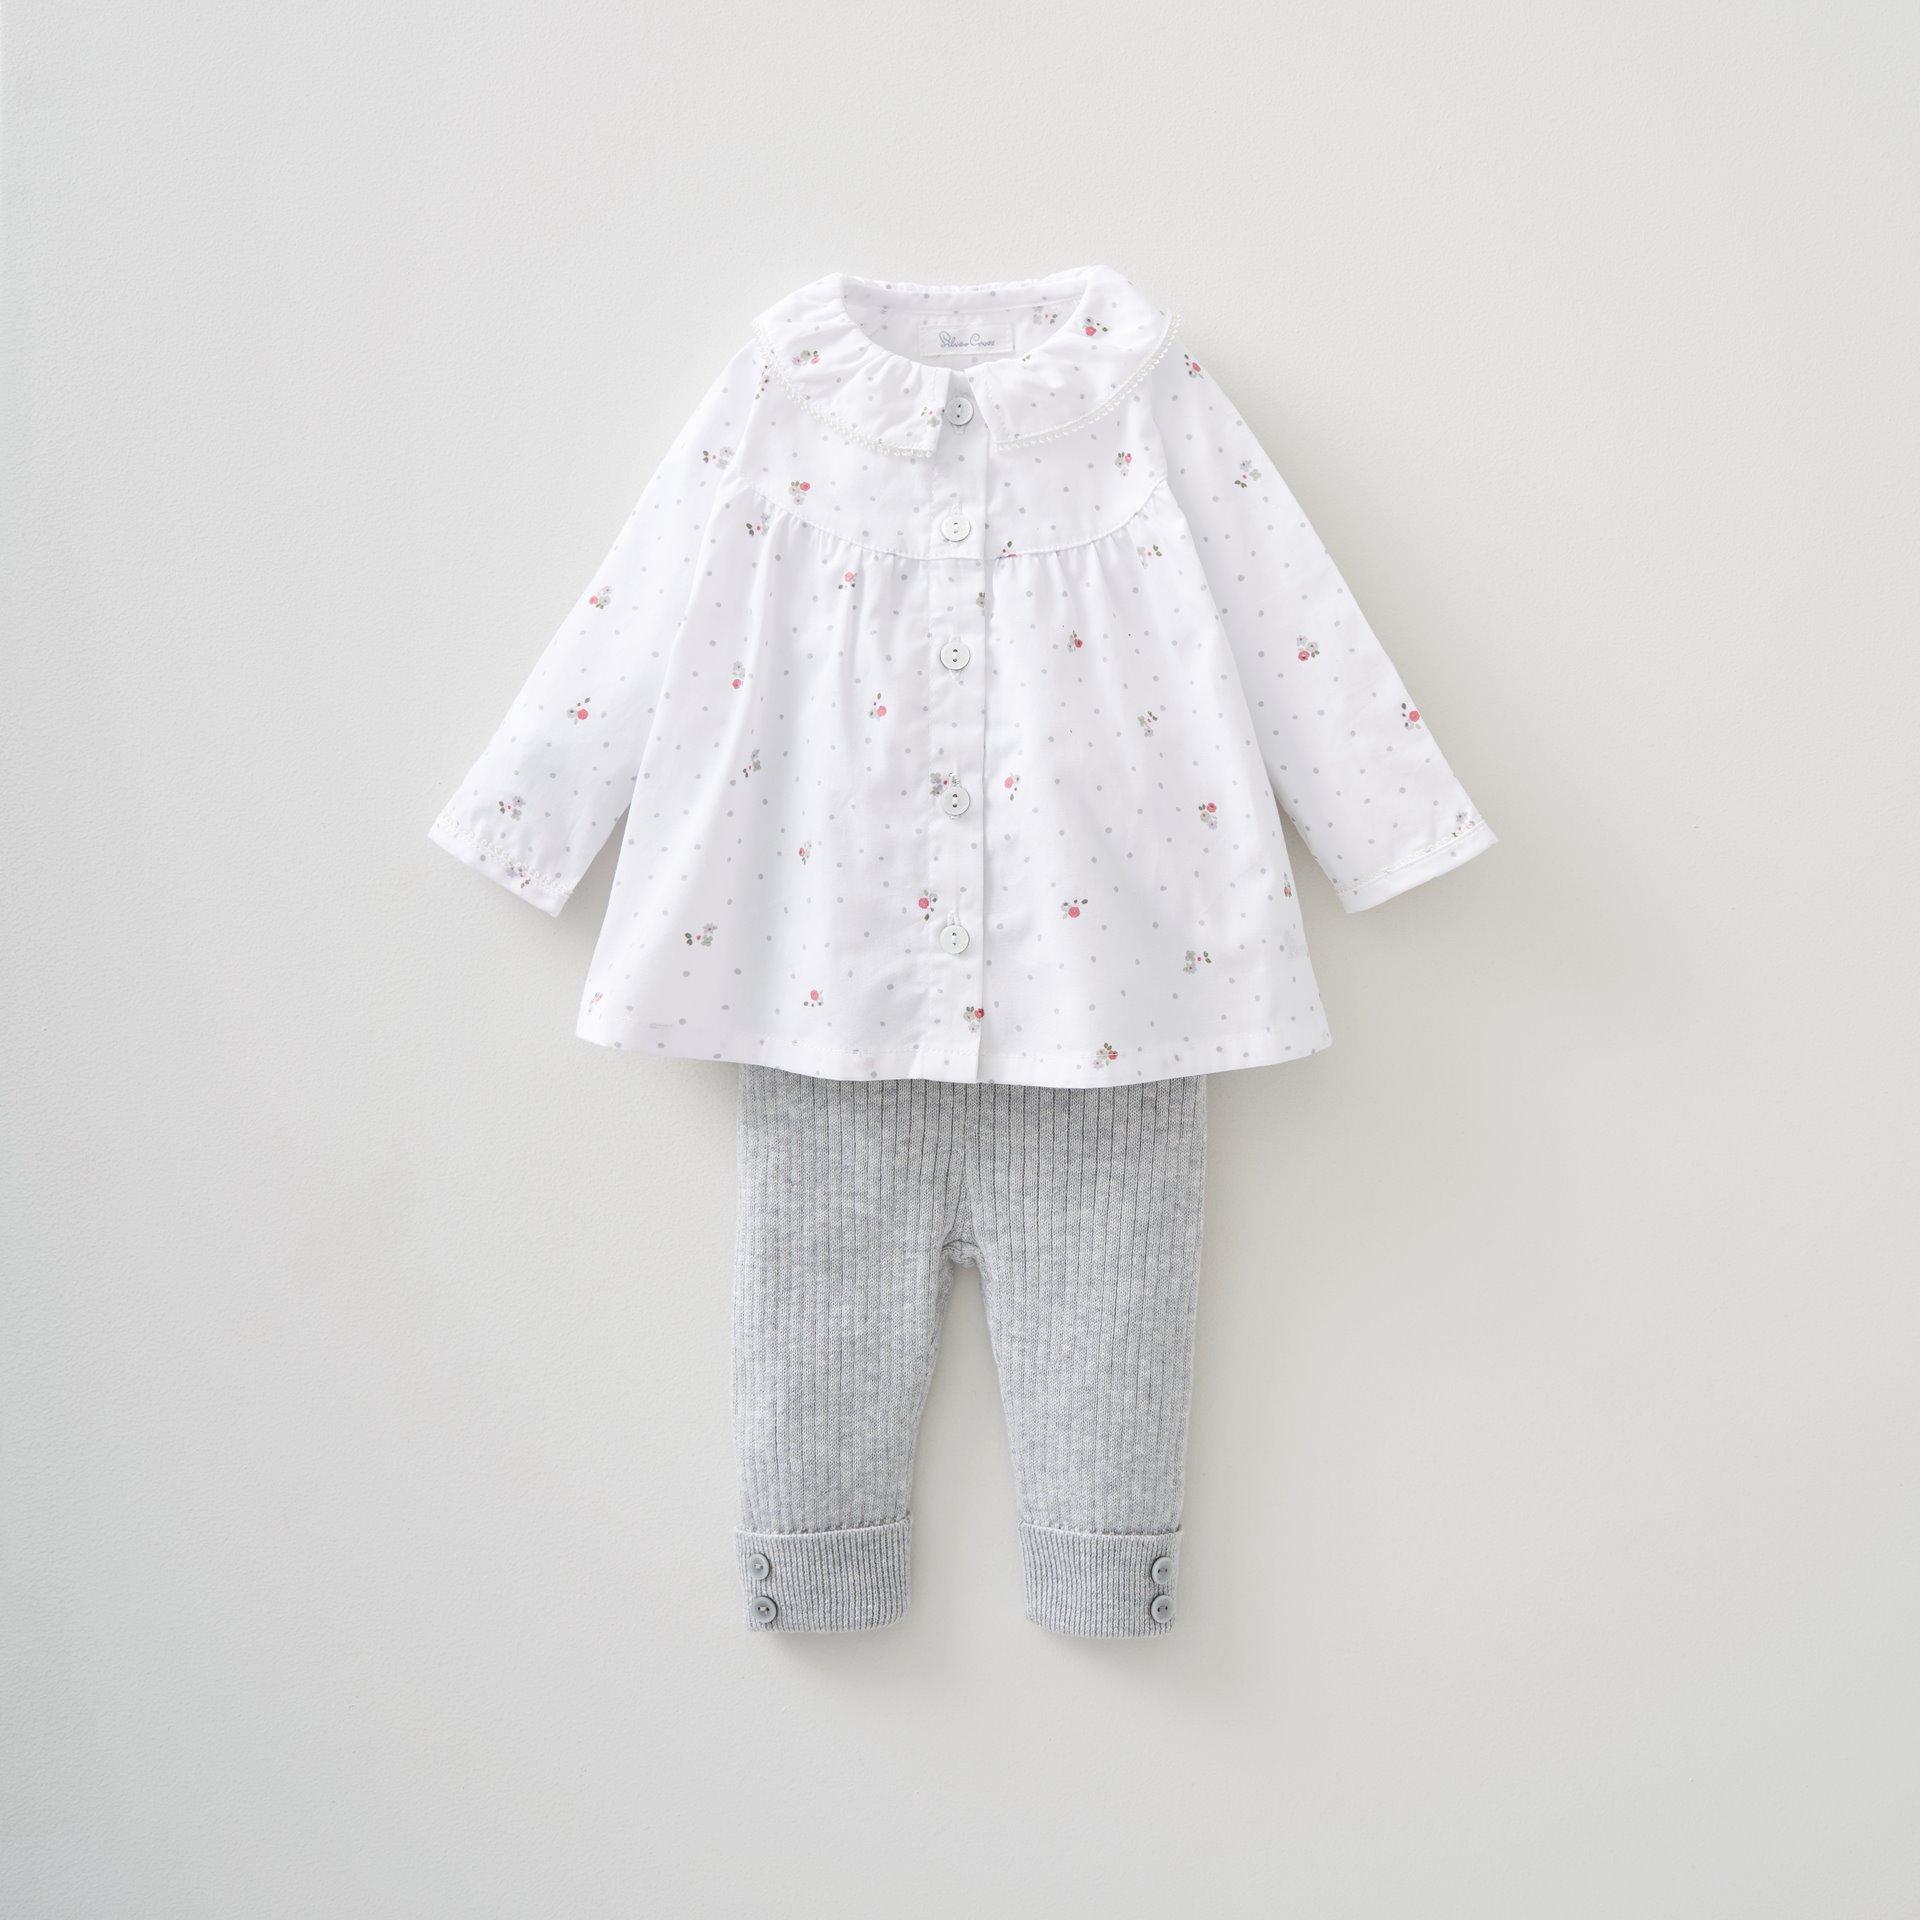 Blouse & Knitted Leggings Set 9-12 Months